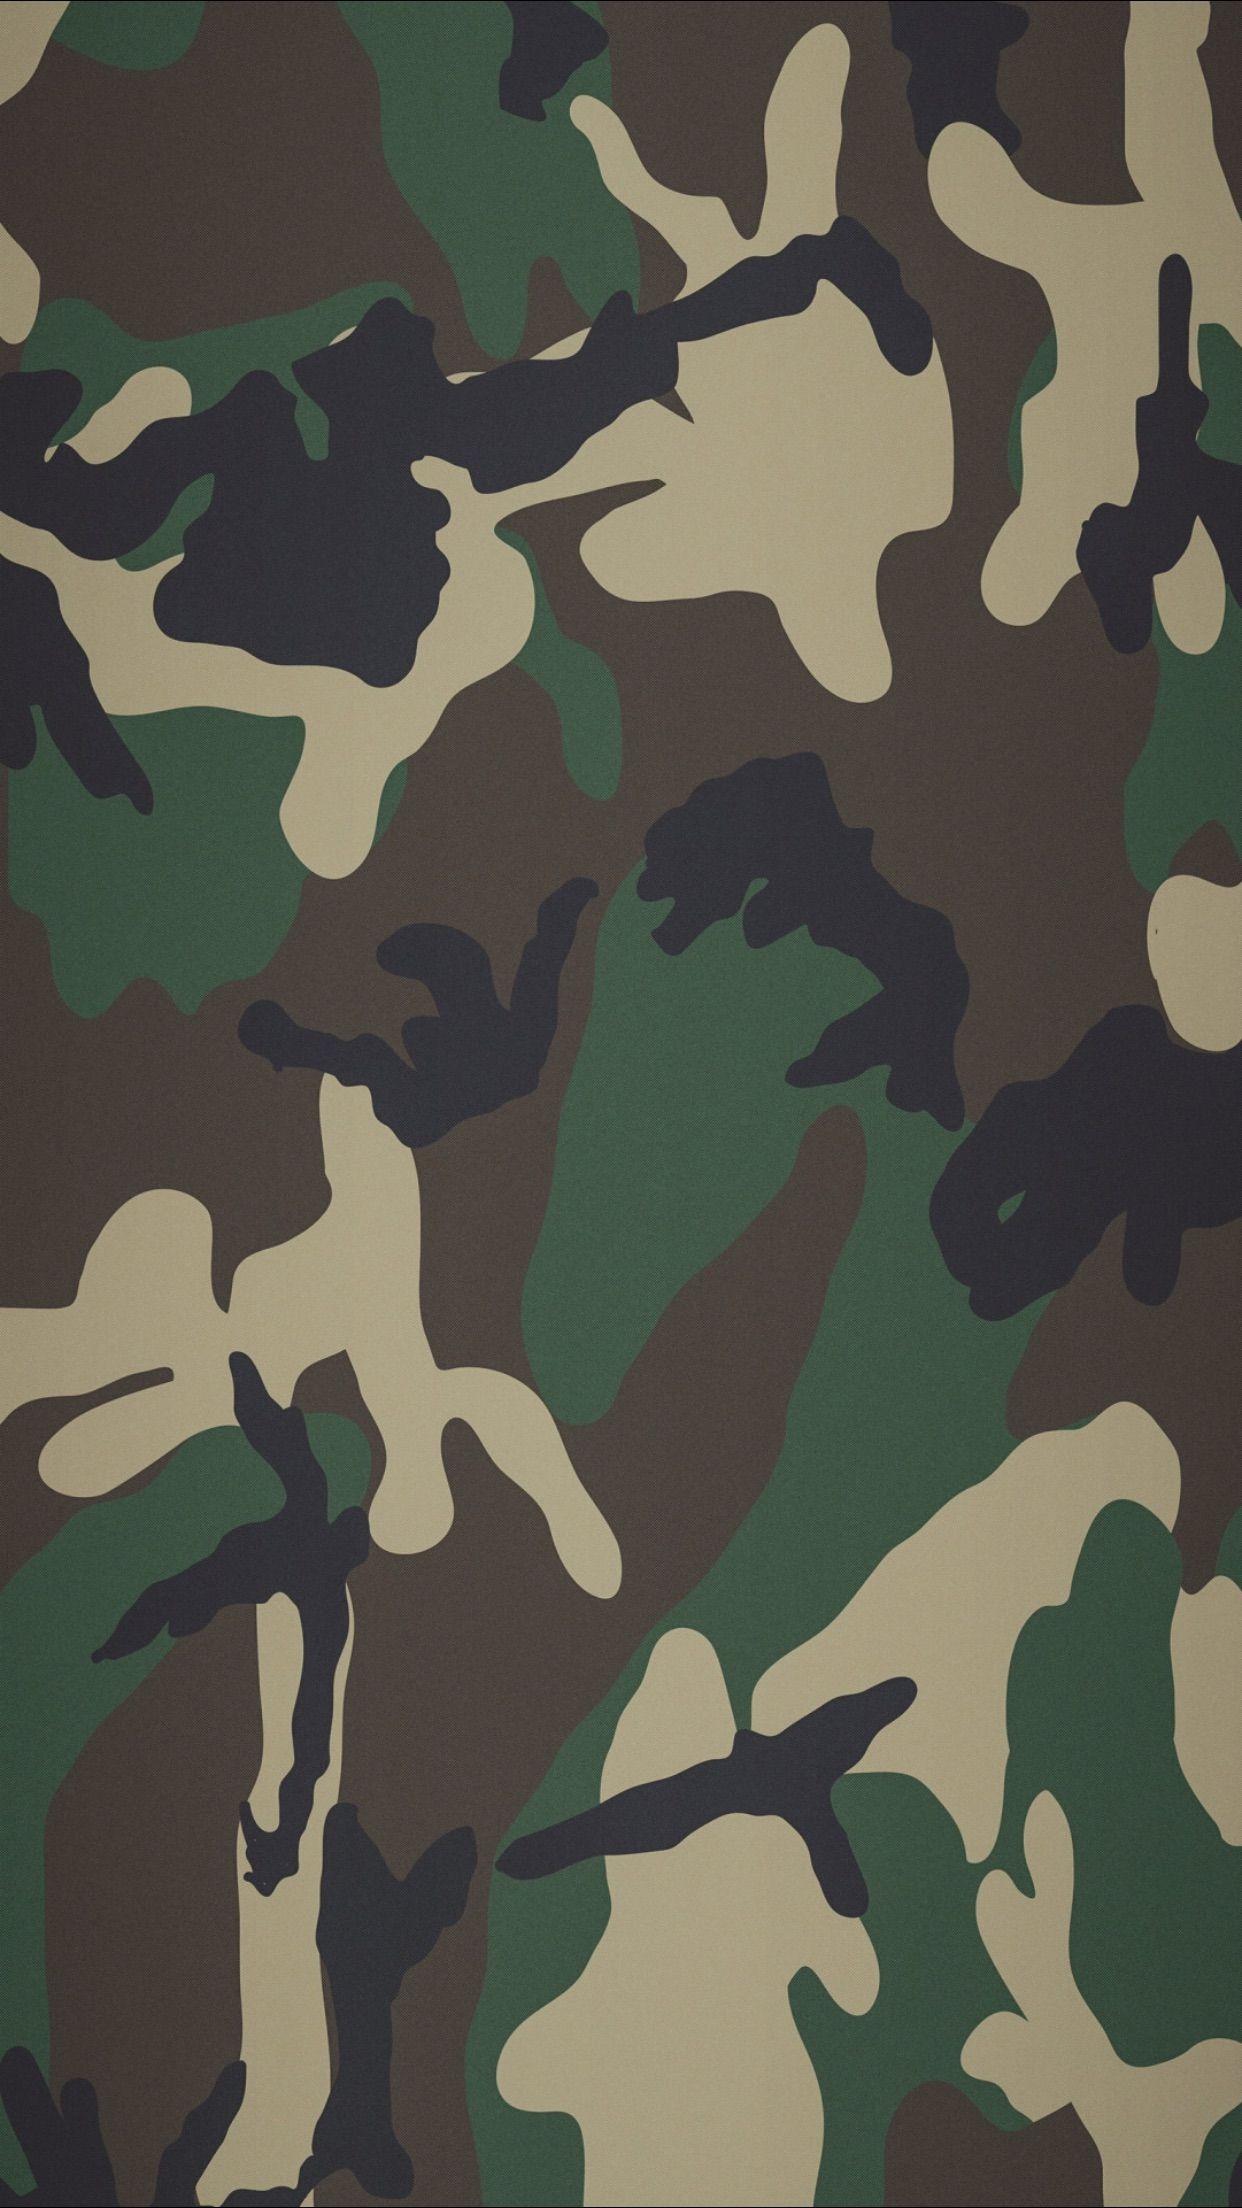 Wallpaper de Edanur Erdul Papel de parede camuflado